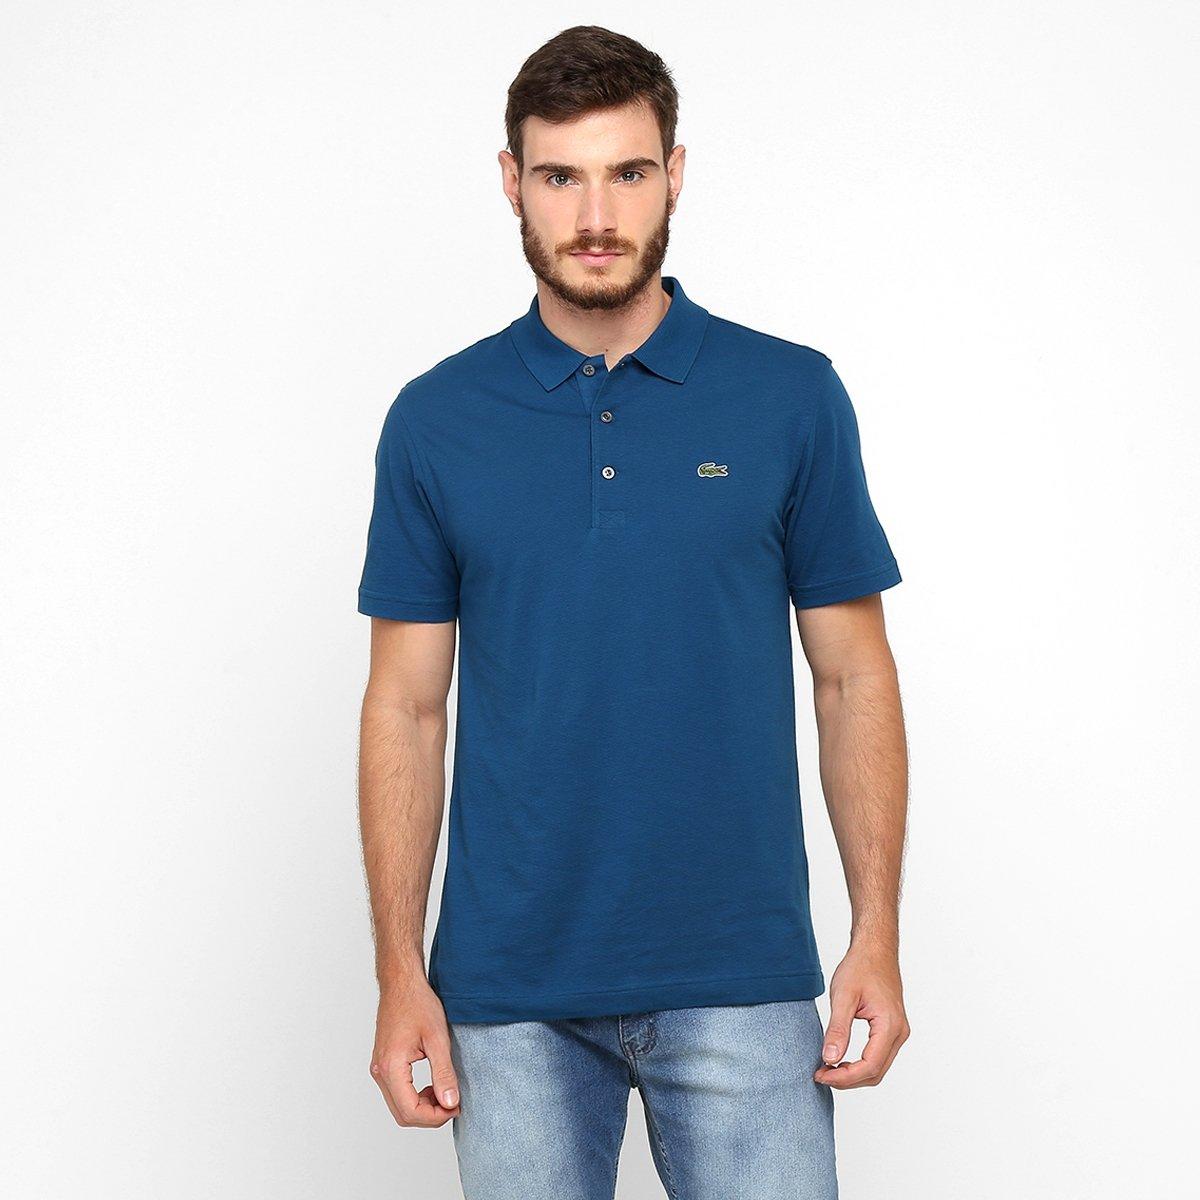 3feb12a059 Camisa Polo Lacoste Super Light Masculina - Azul Petróleo - Compre ...